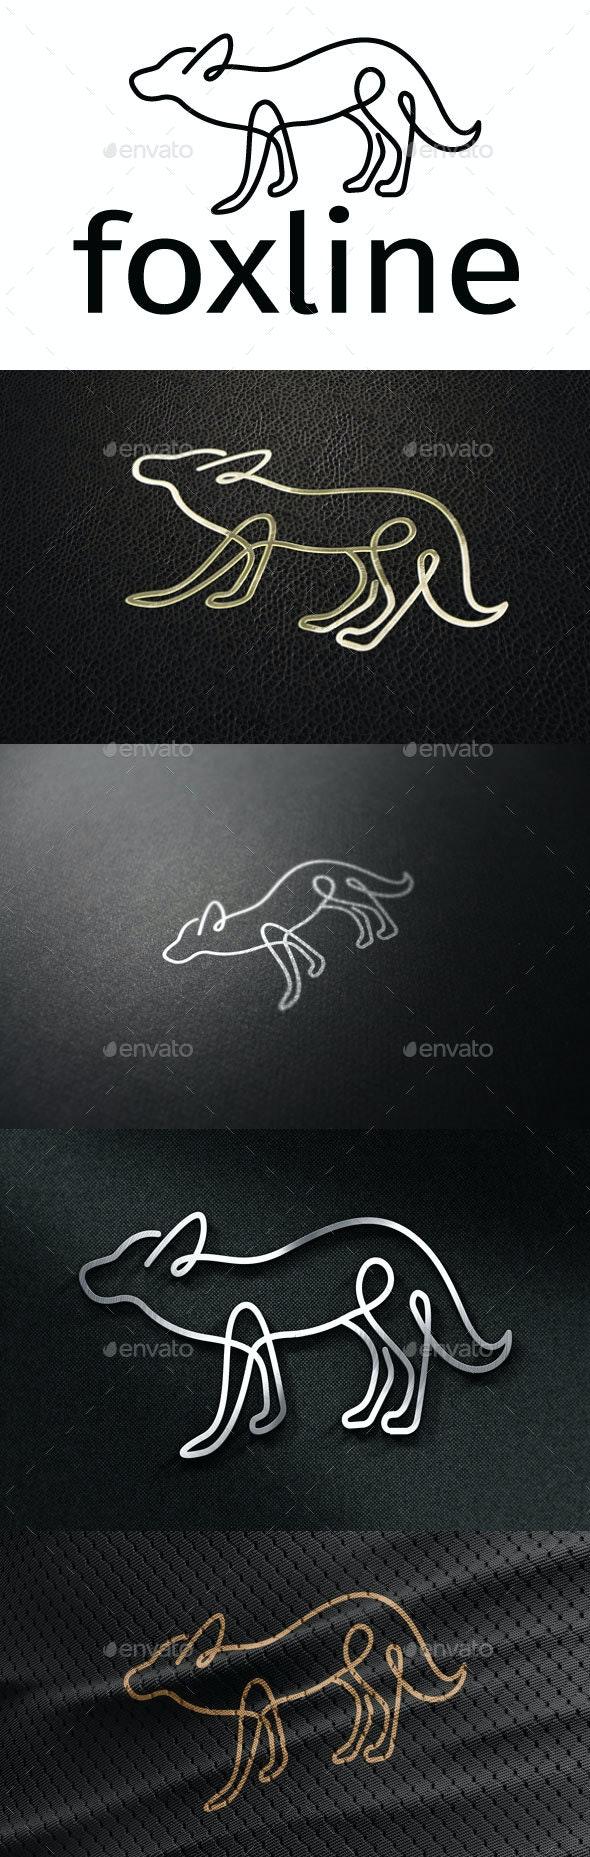 Foxline Logo - Animals Logo Templates